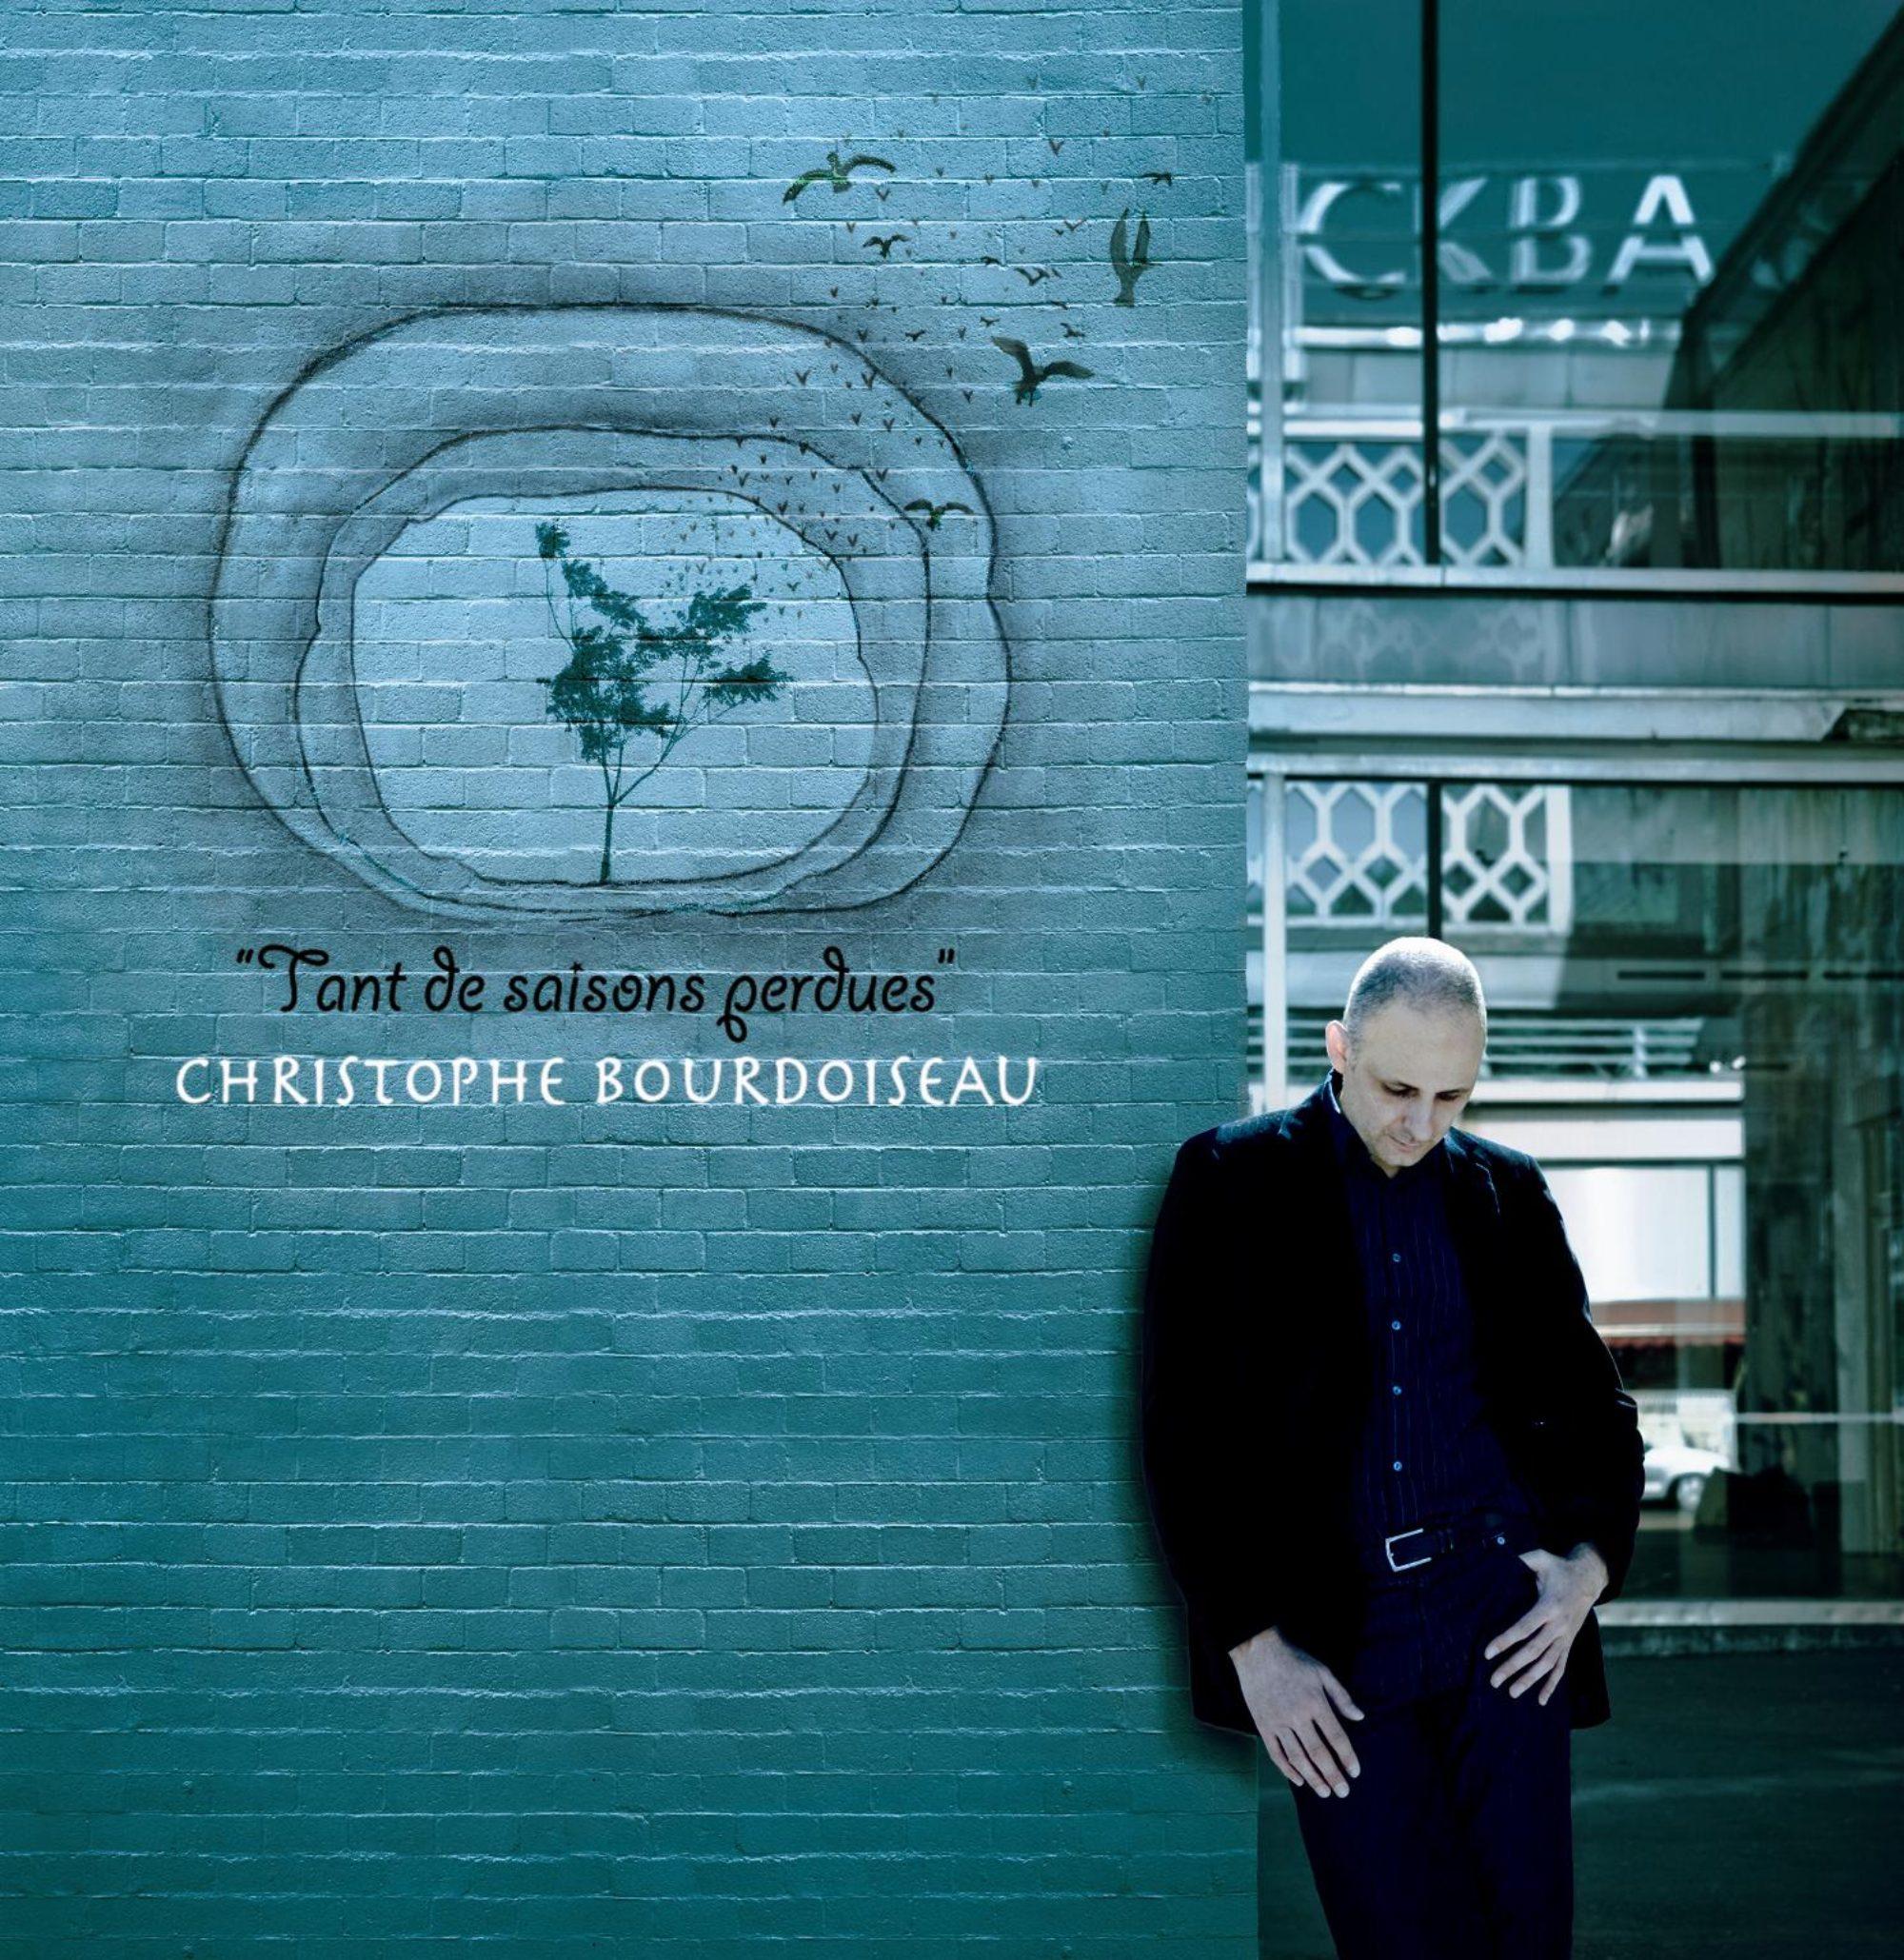 christophebourdoiseau.com